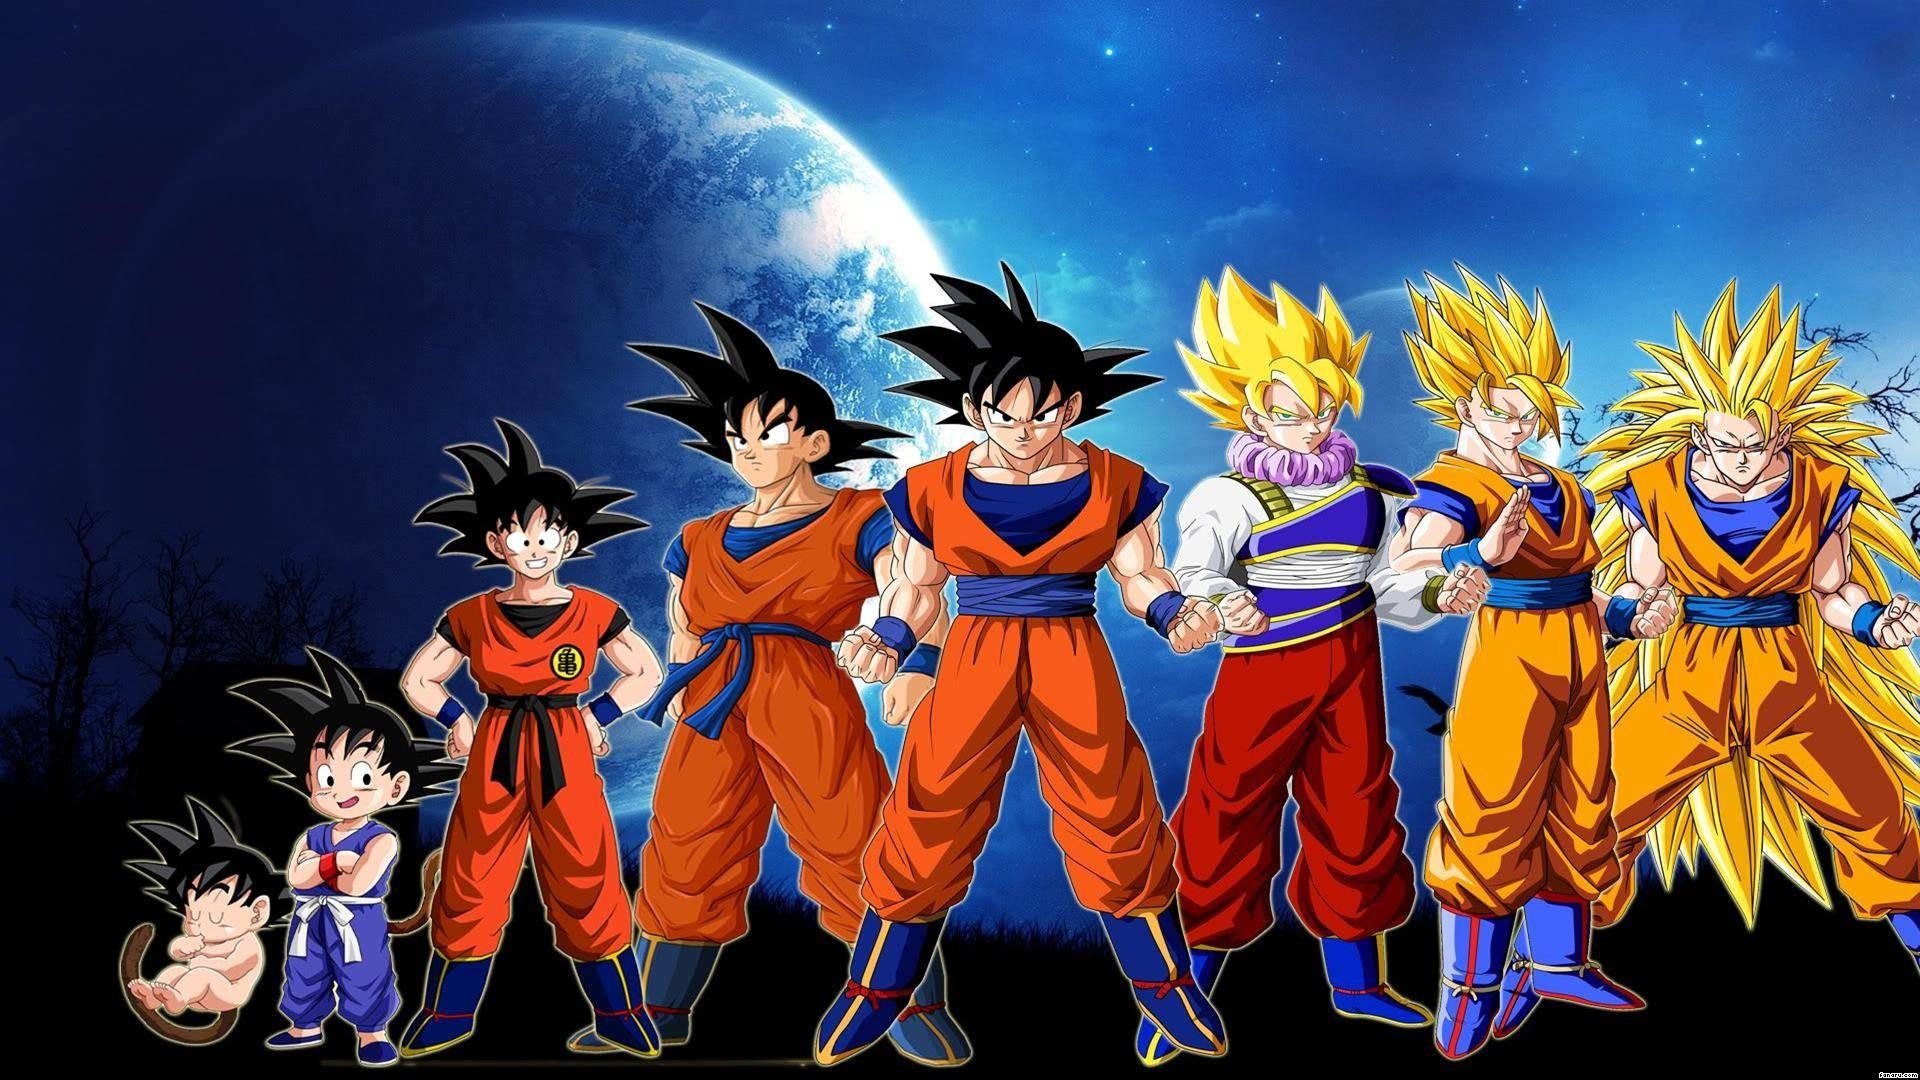 Dragon Ball Z wallpapers photo